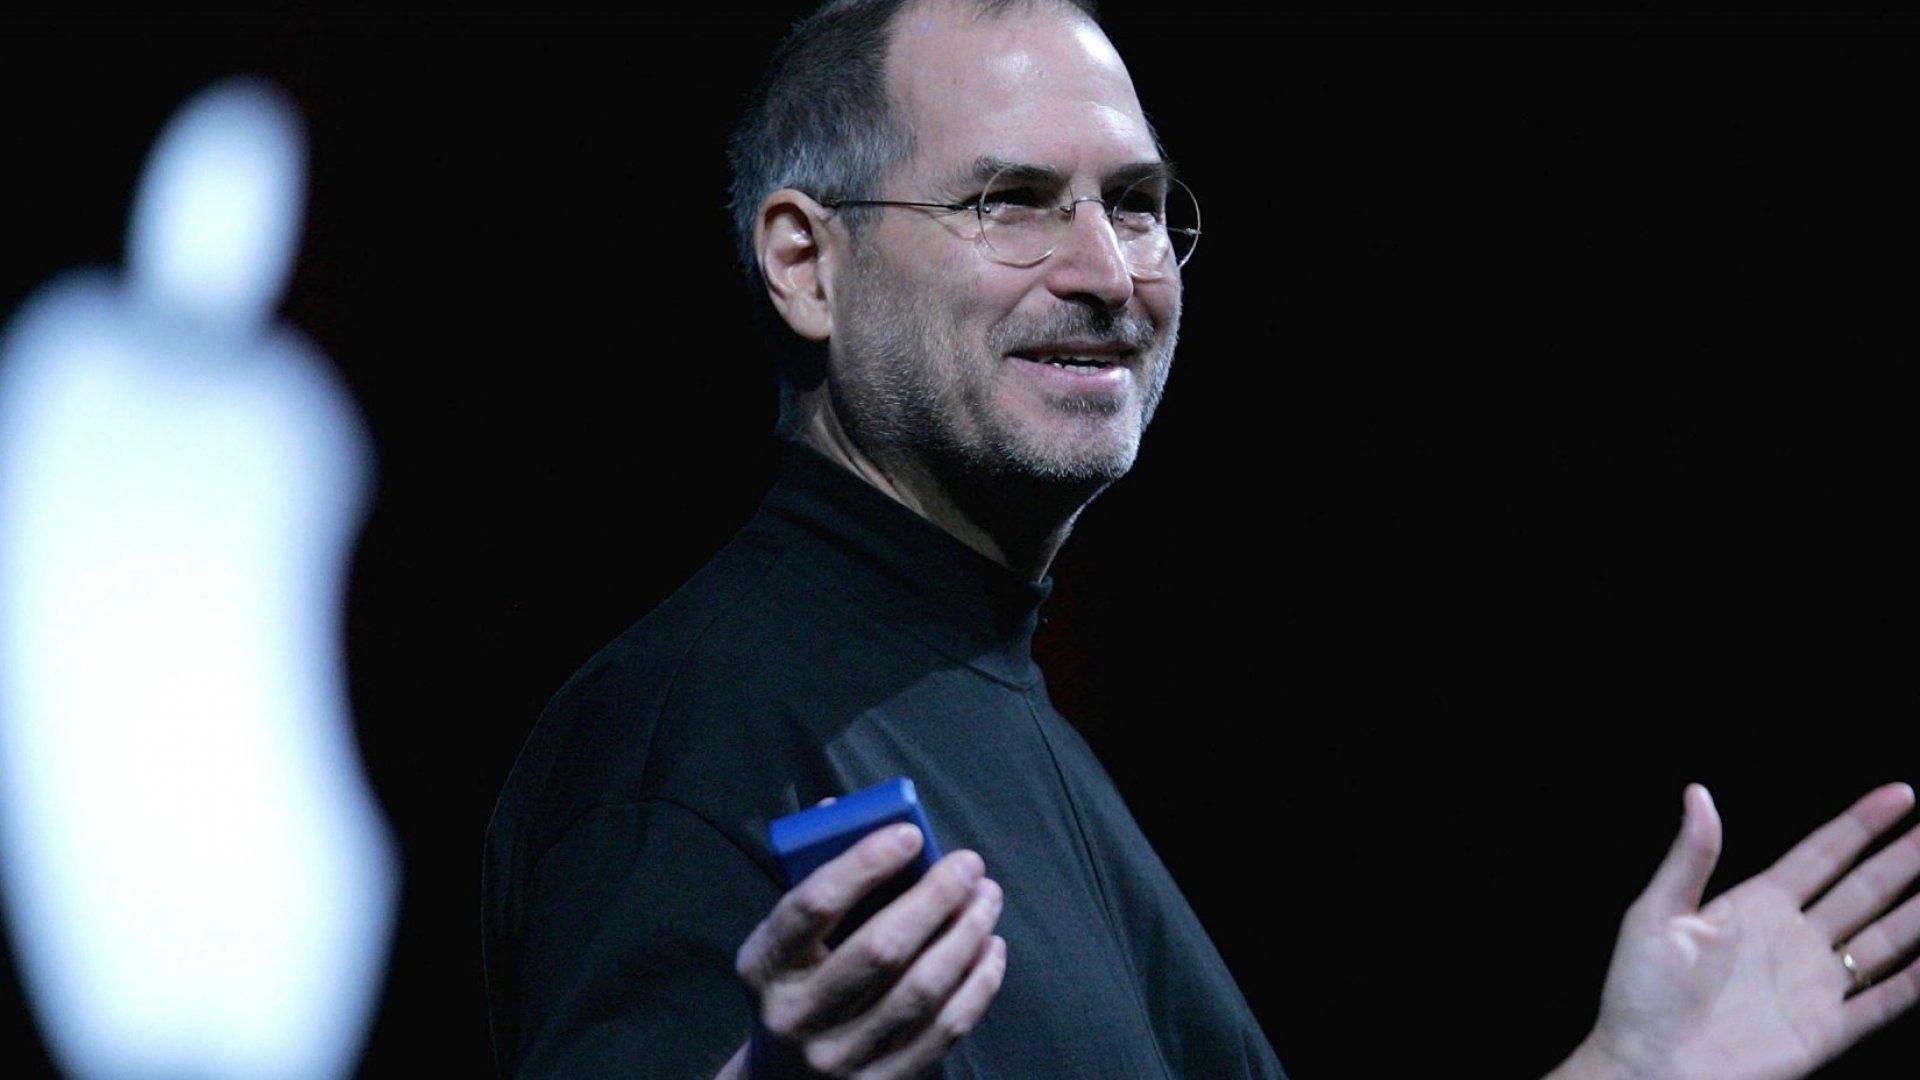 Steve Jobs' Life as An Entrepreneur Really Was an Opera